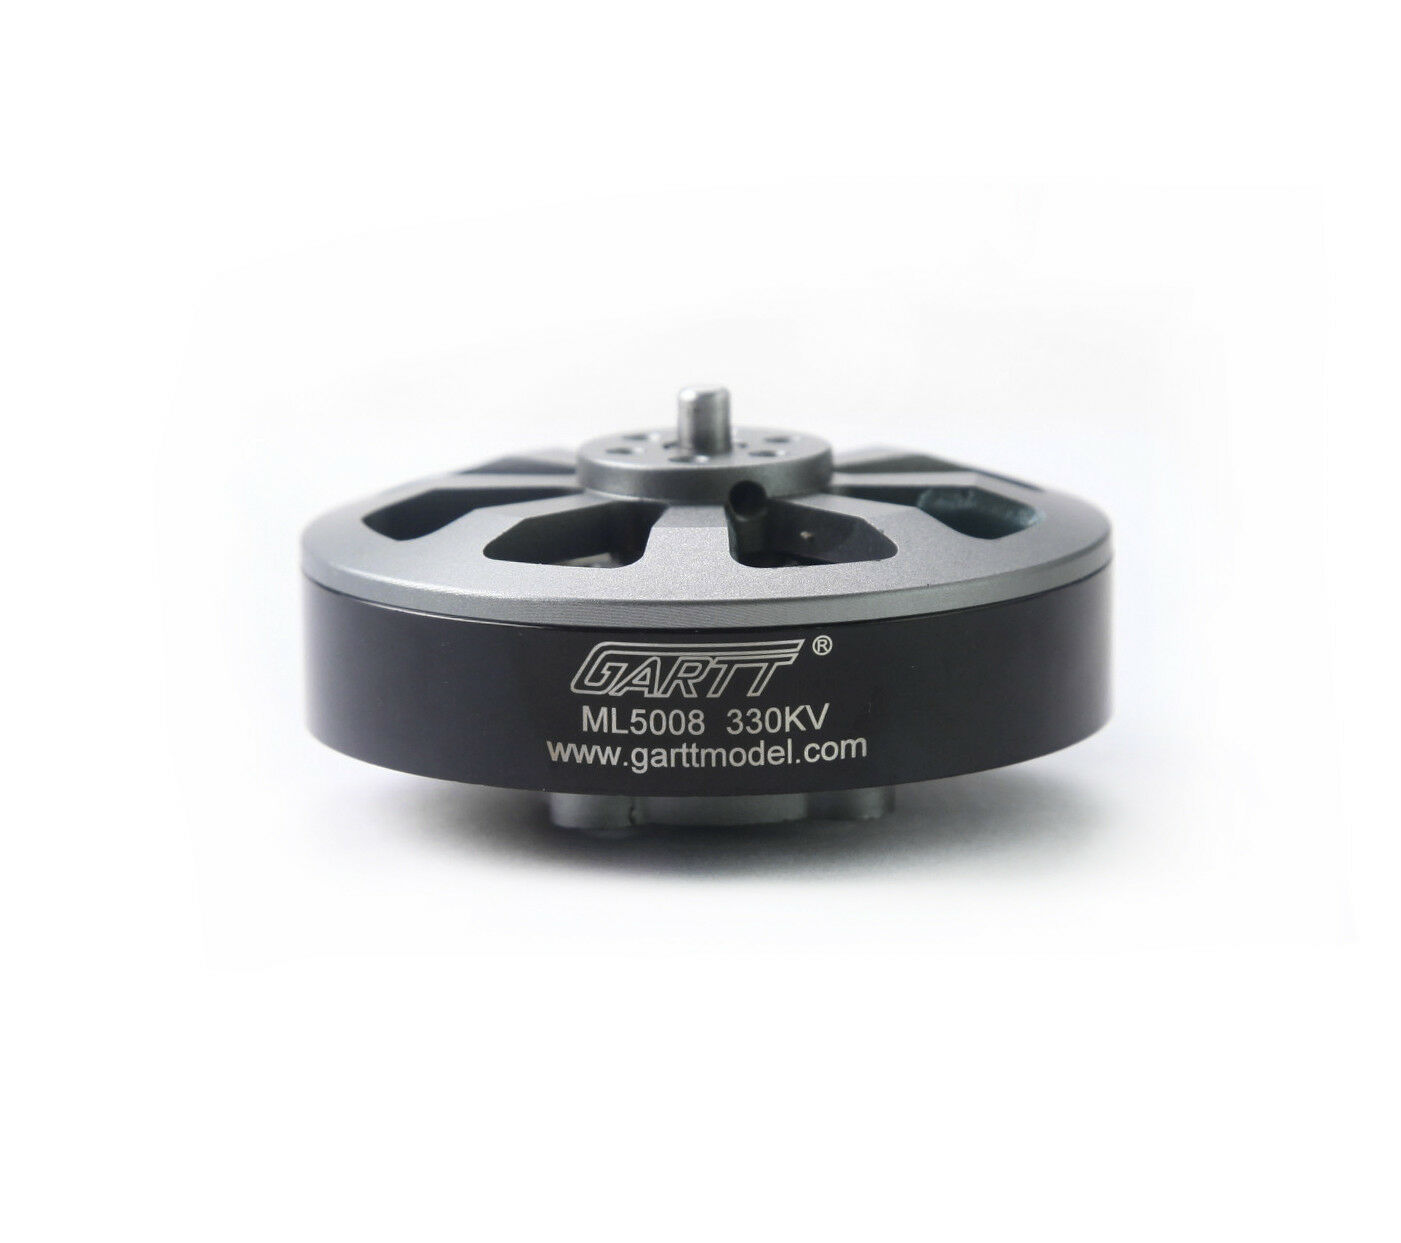 Gartt ML5008 330 kV motore brushless per multicottero esacottero combinazione T960 T810 Drone UK